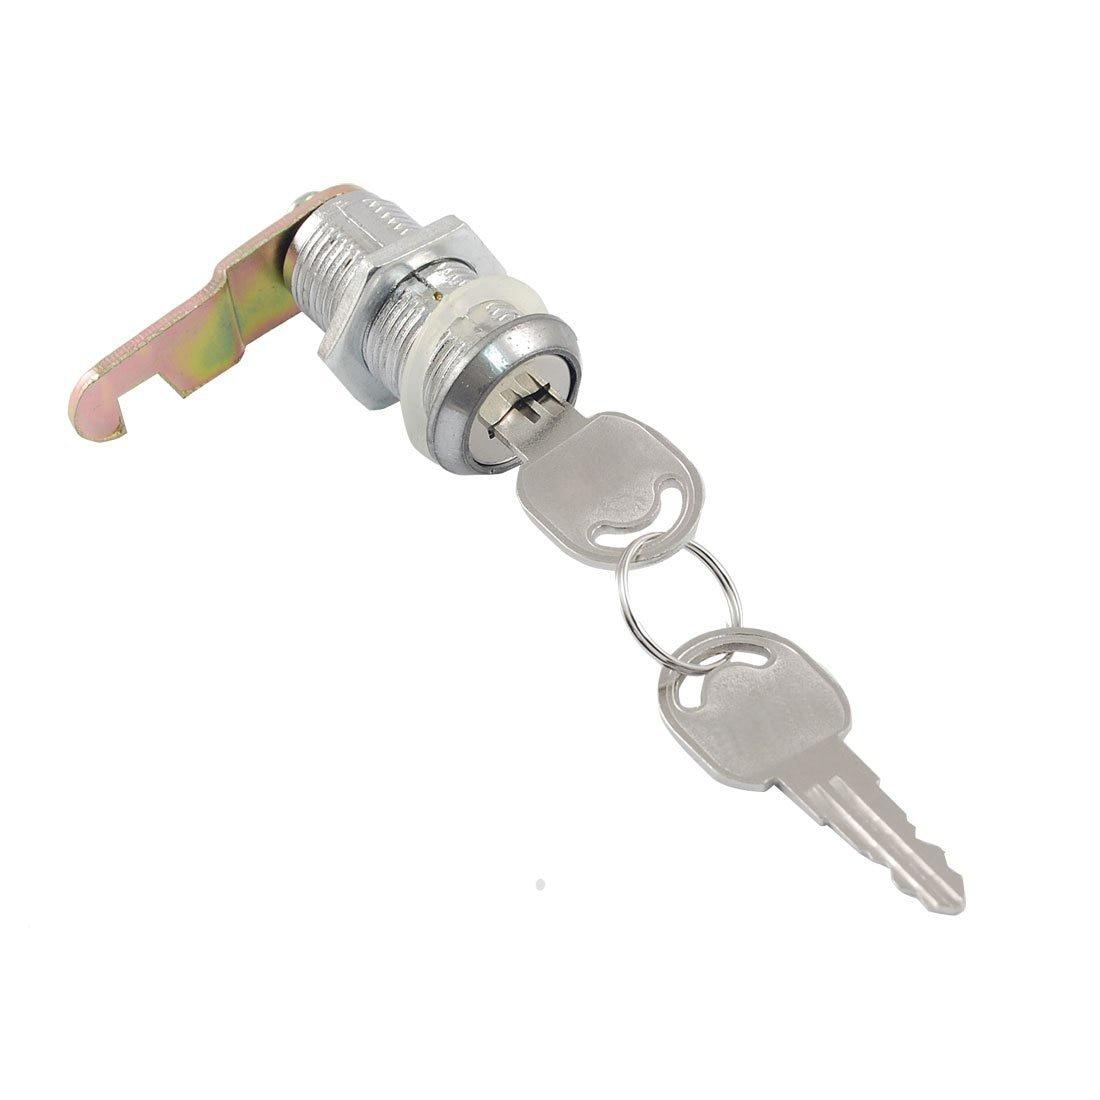 17.5mm X 25mm Thread Cabinet Mailbox Drawer Quarter Turn Cam Lock Diversified Latest Designs